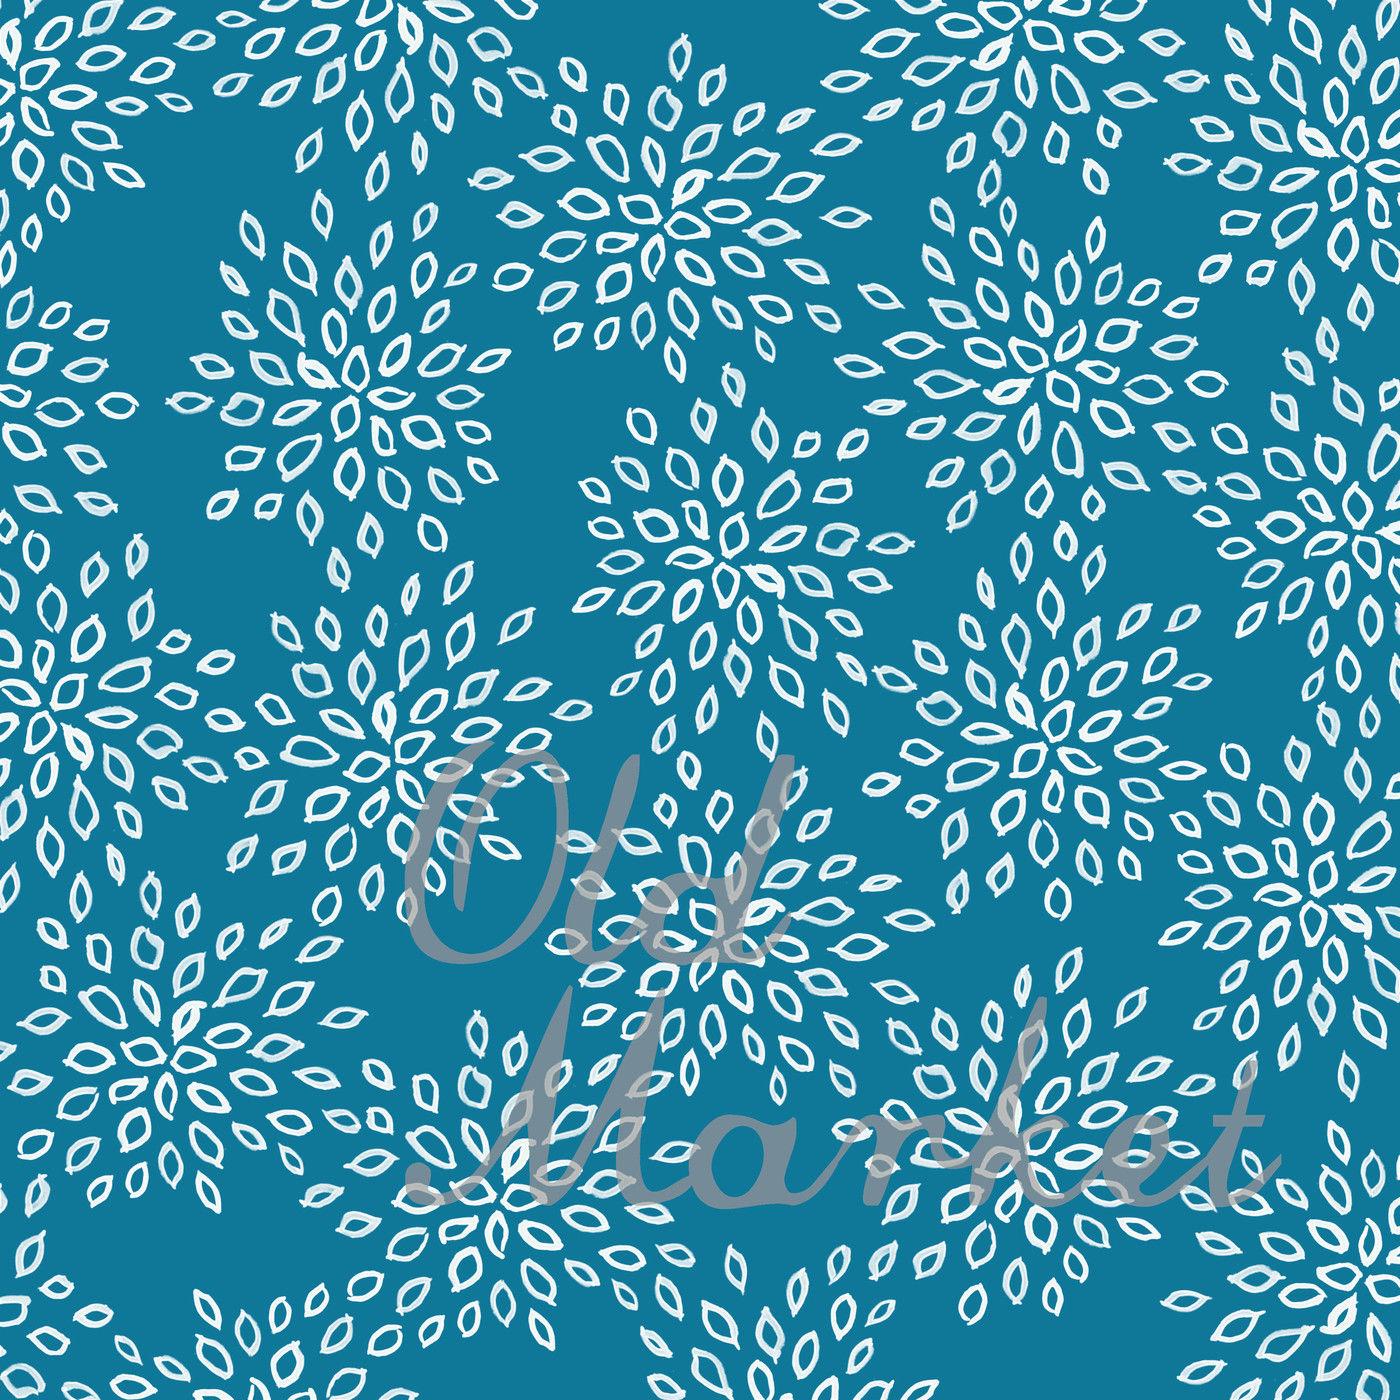 Blue Patterns Digital Paper By Shannon Keyser Thehungryjpeg Com